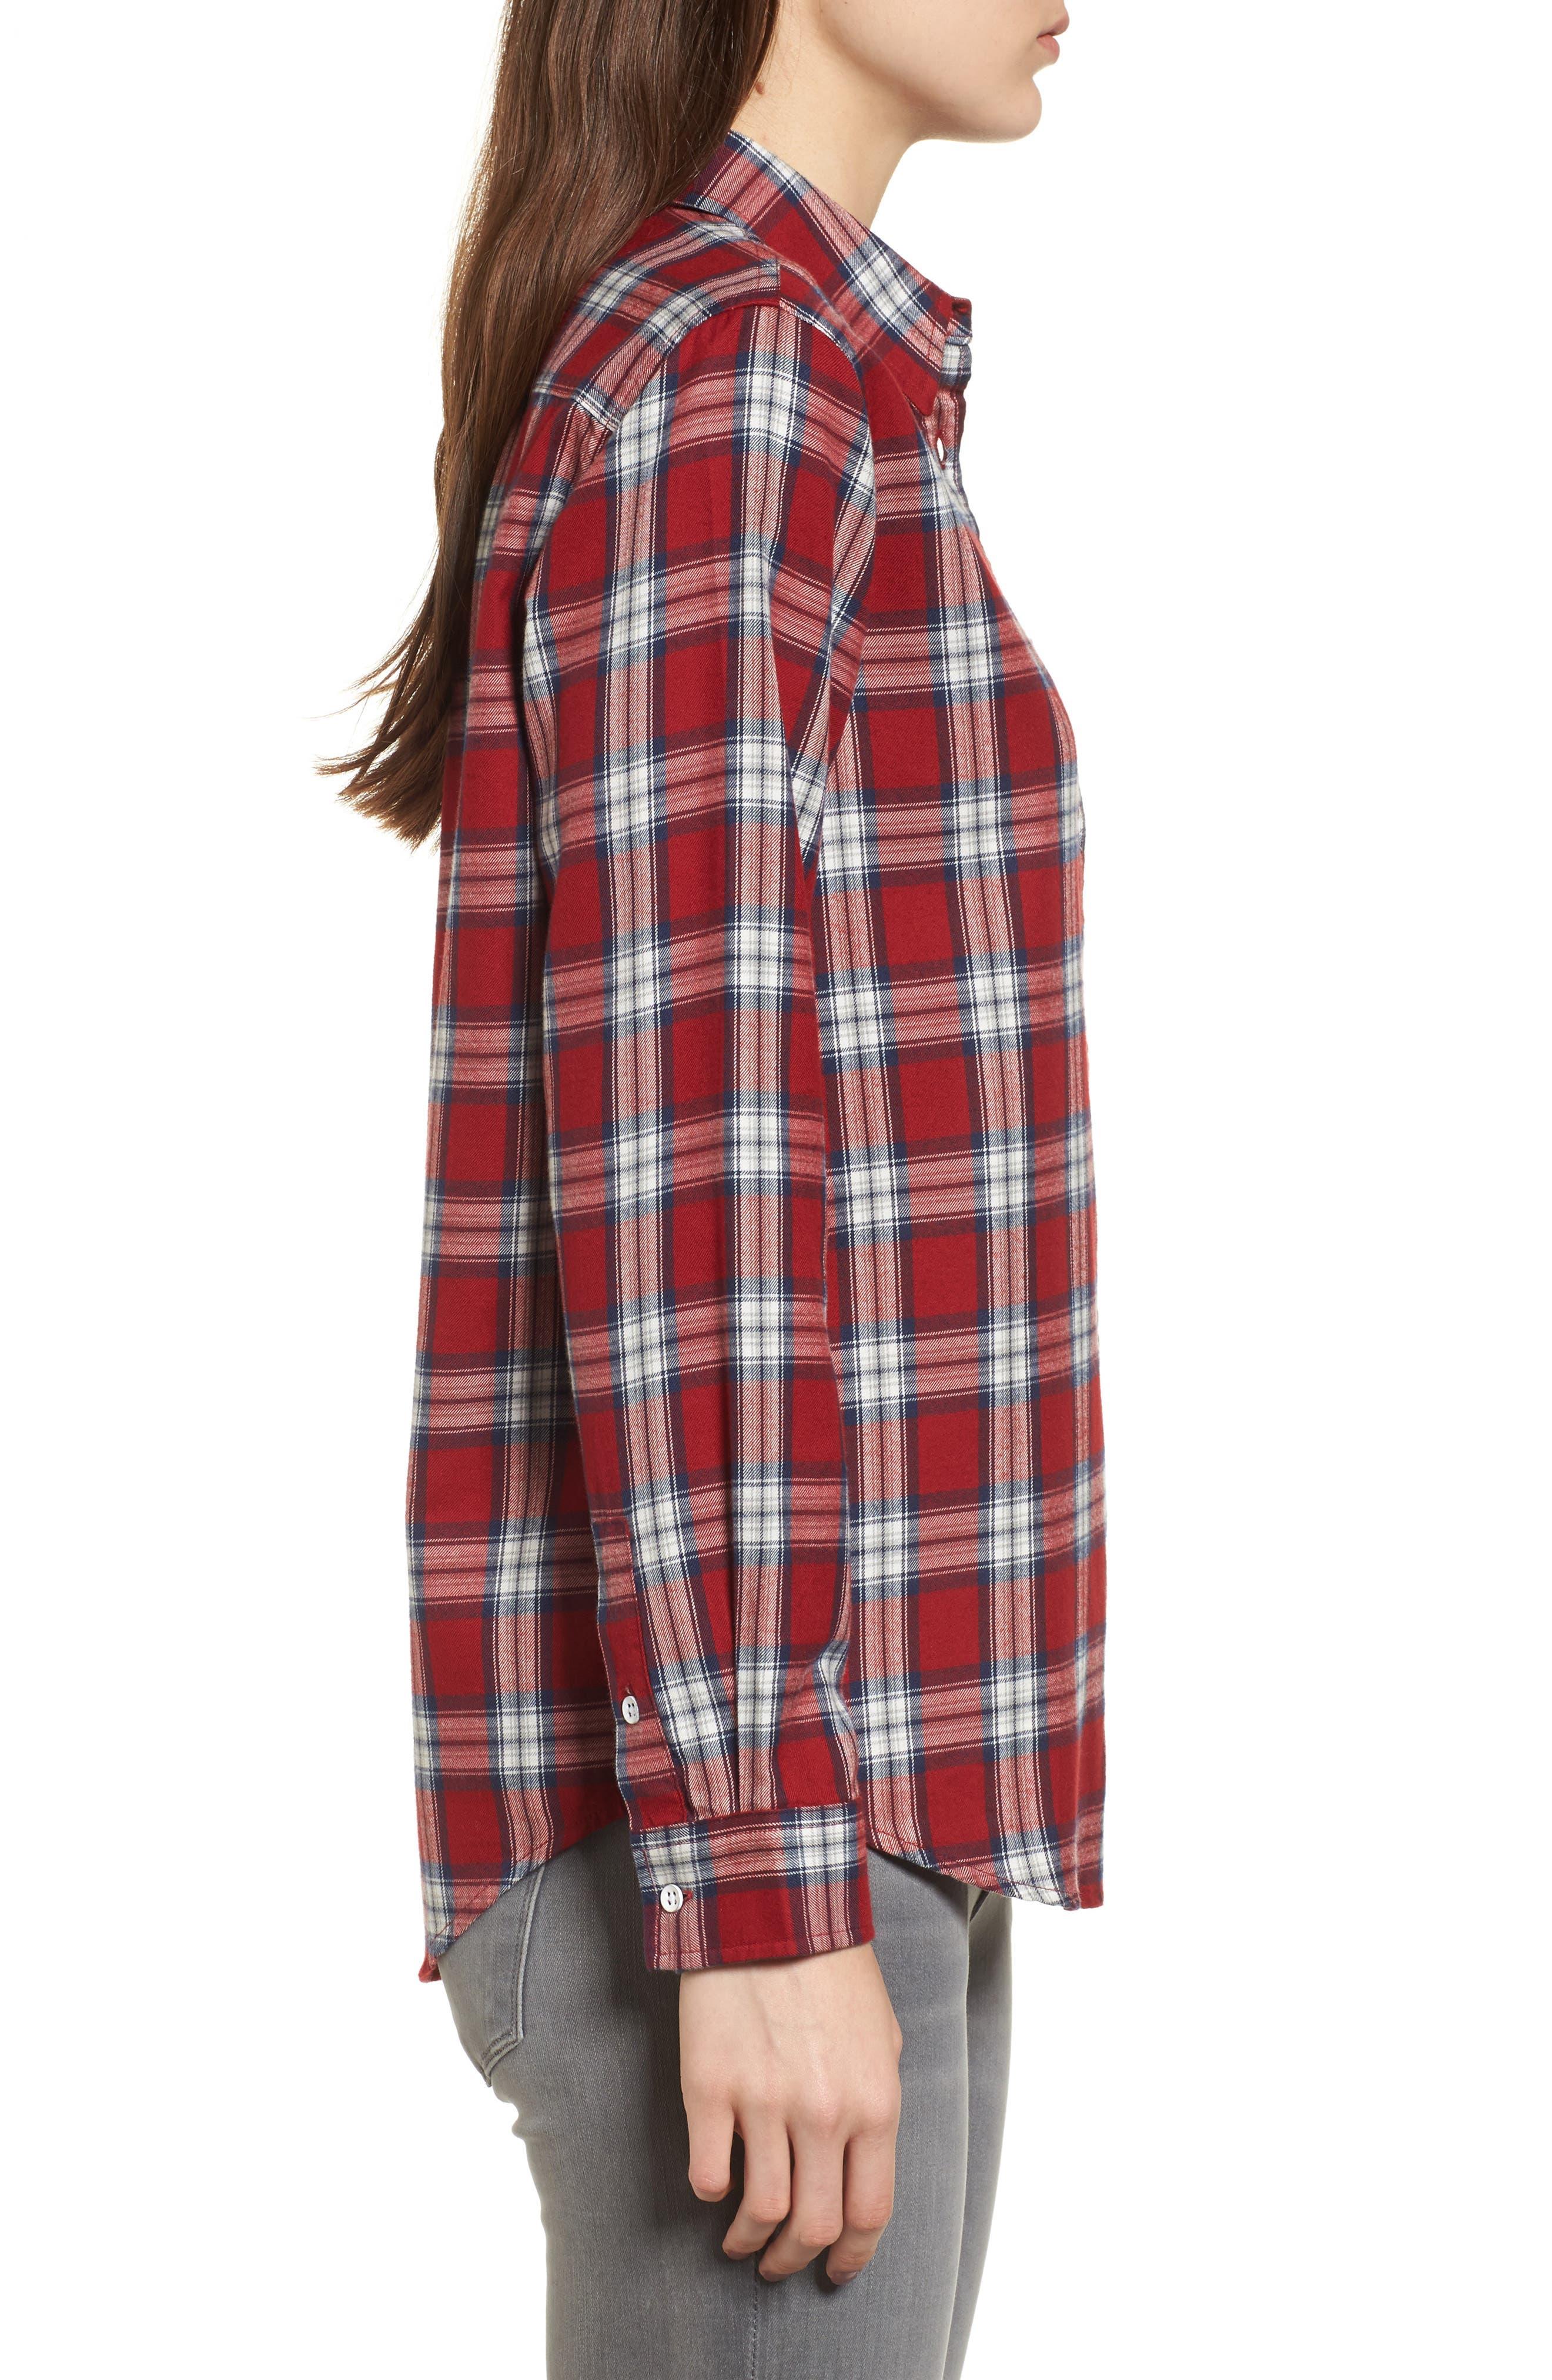 Mercer & Spring Plaid Shirt,                             Alternate thumbnail 3, color,                             Red Plaid